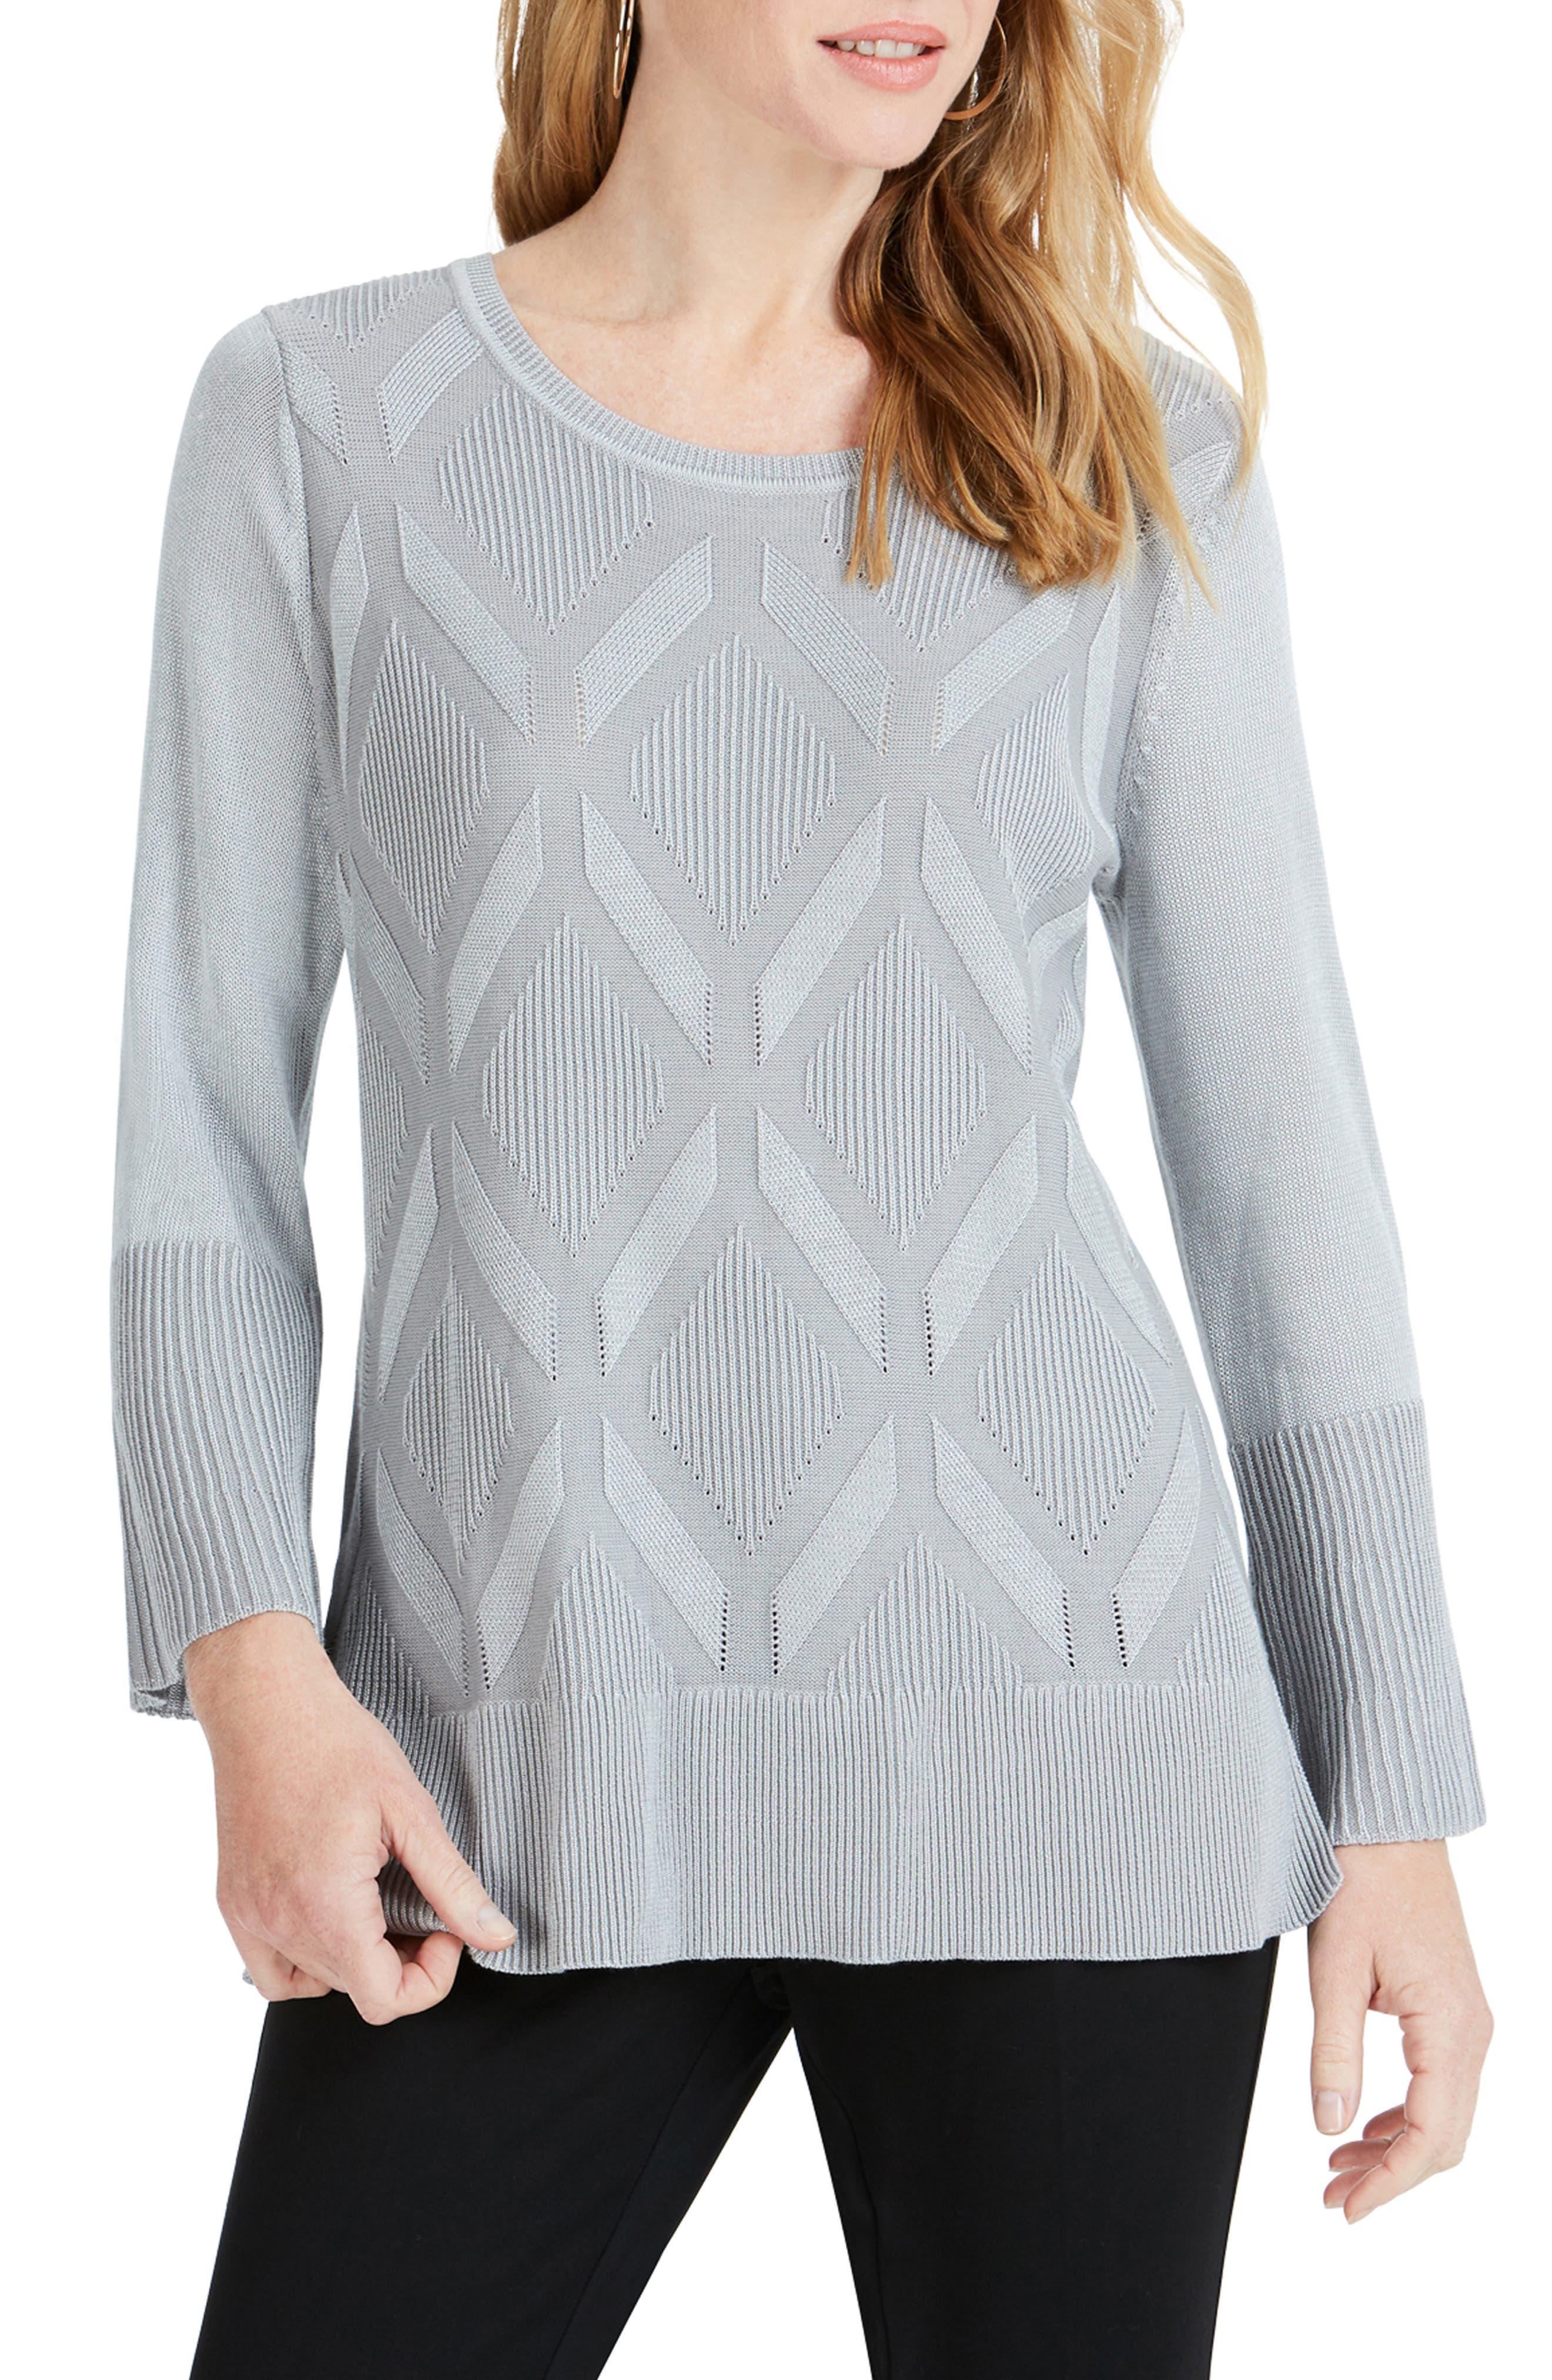 FOXCROFT Dion Diamond Pattern Sweater in Sterling